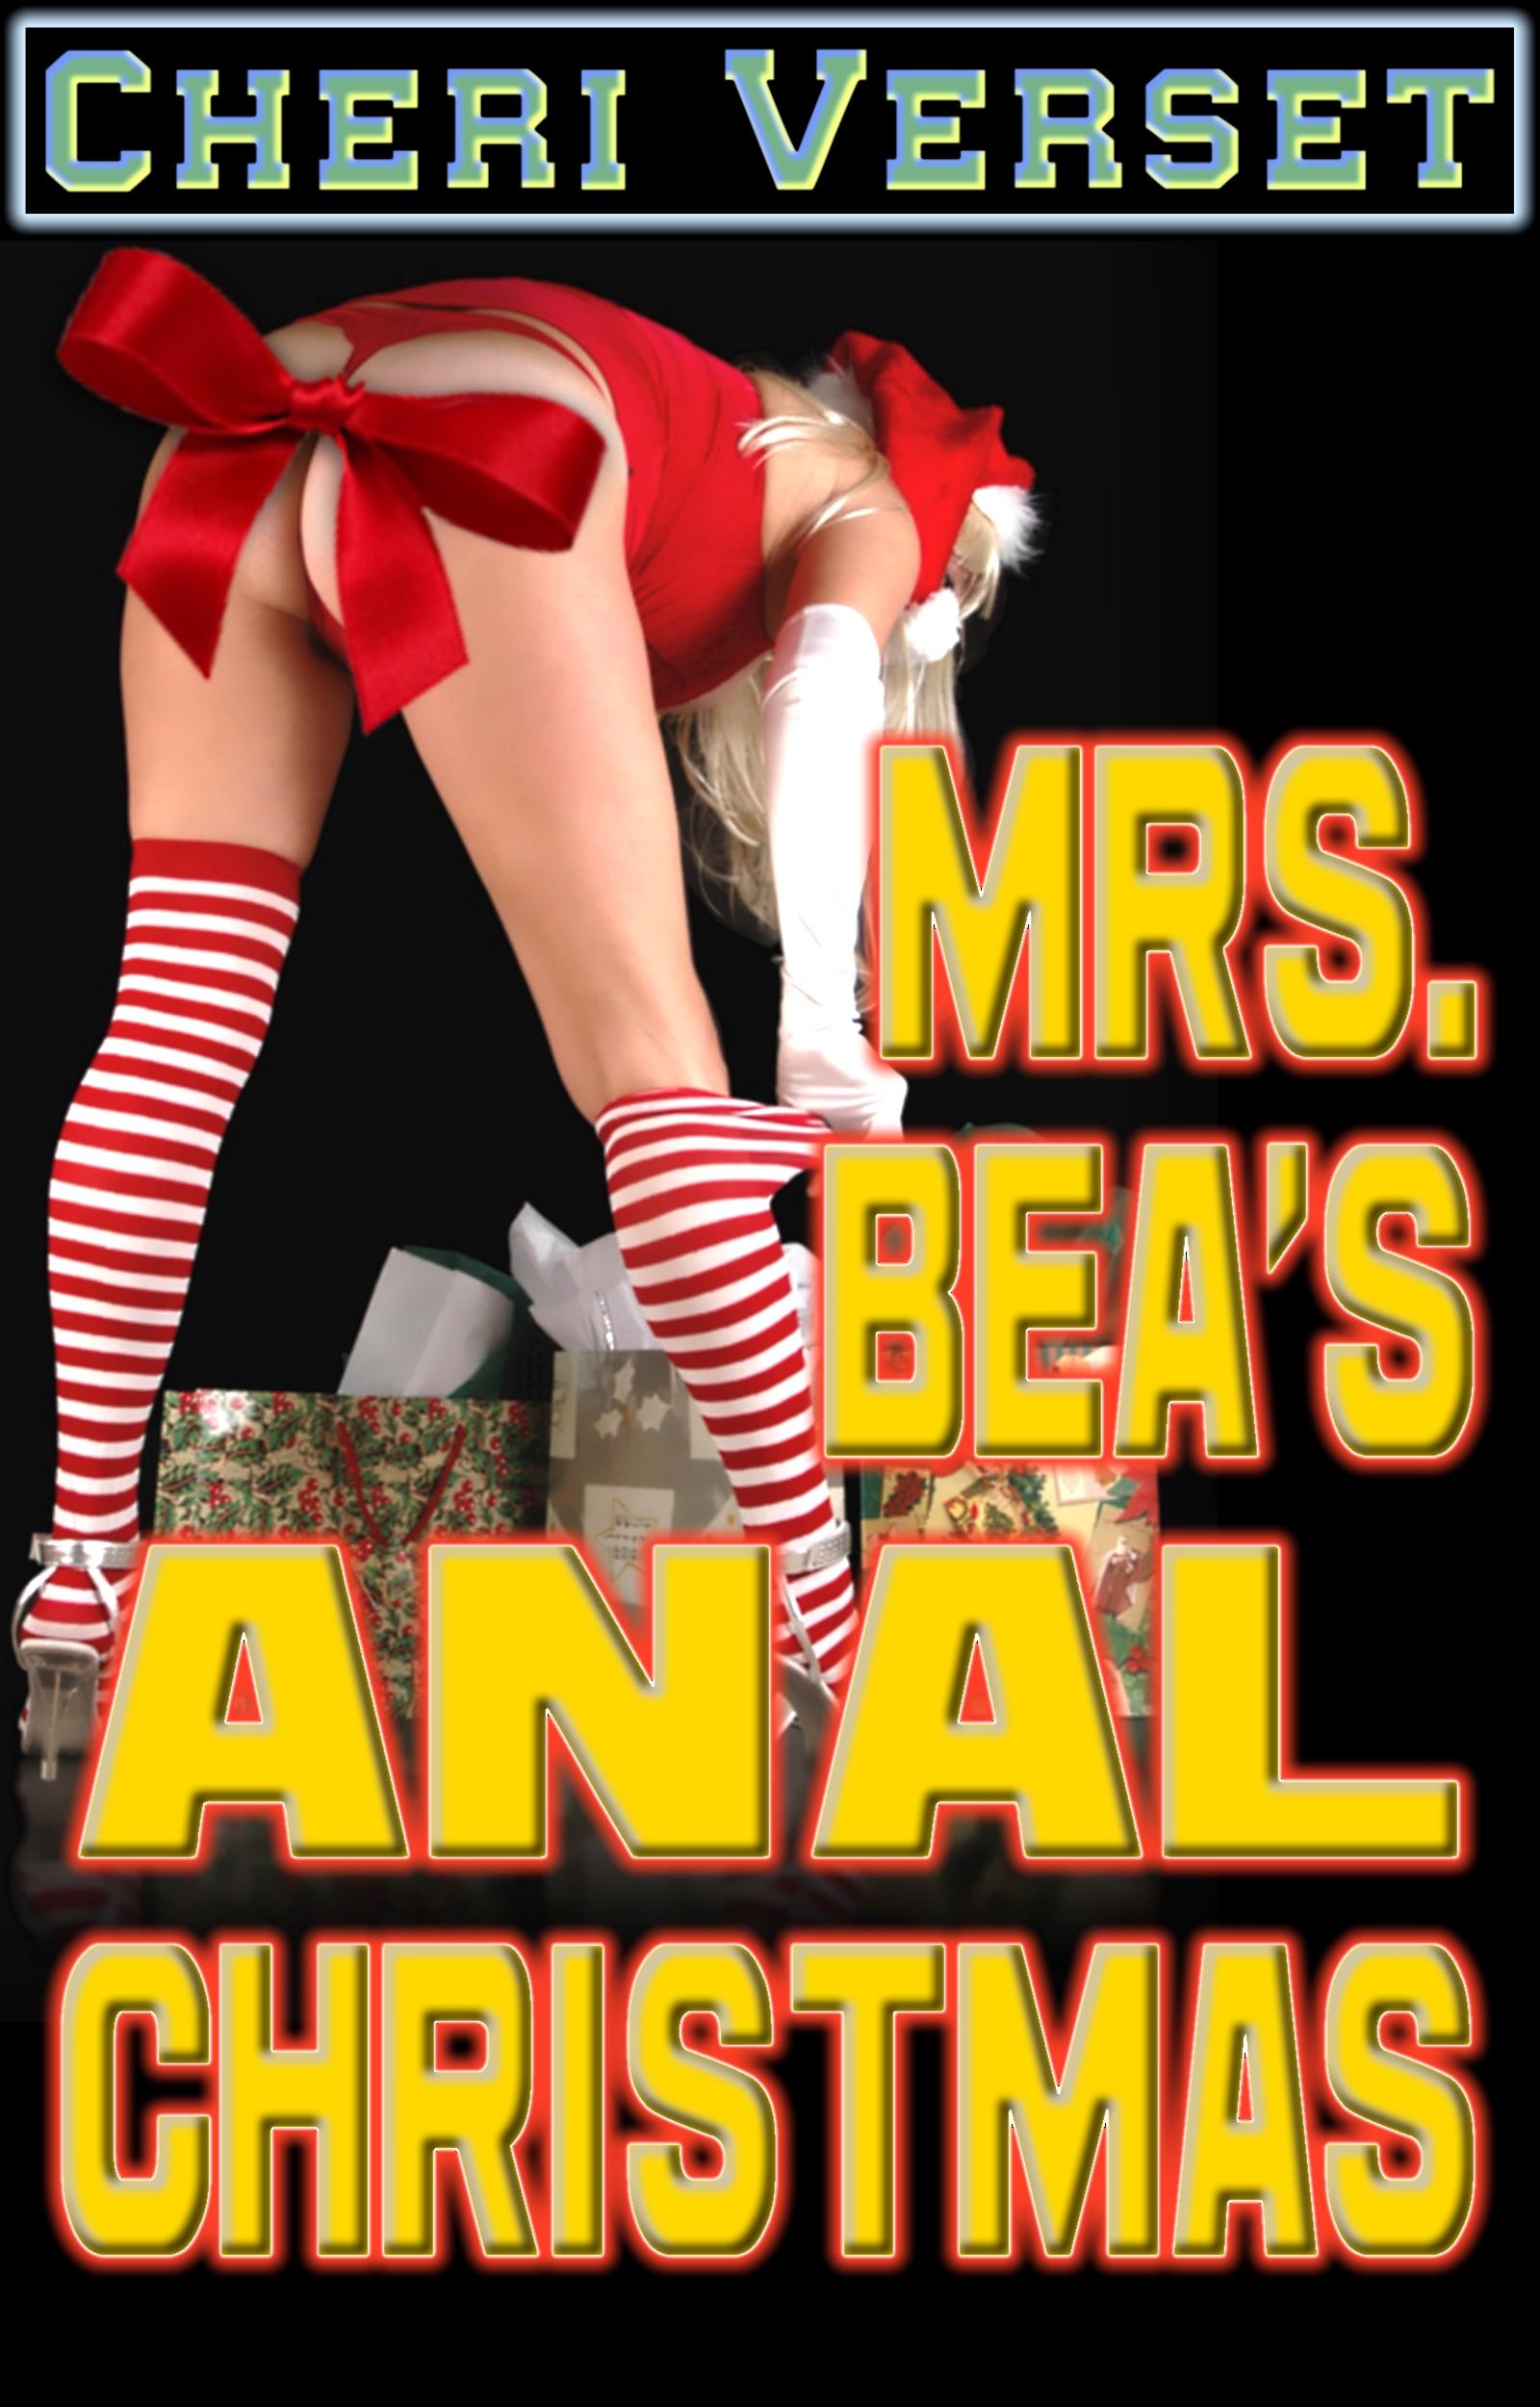 Cheri Verset - Mrs. Bea's Anal Christmas (erotic BBW sex erotica)